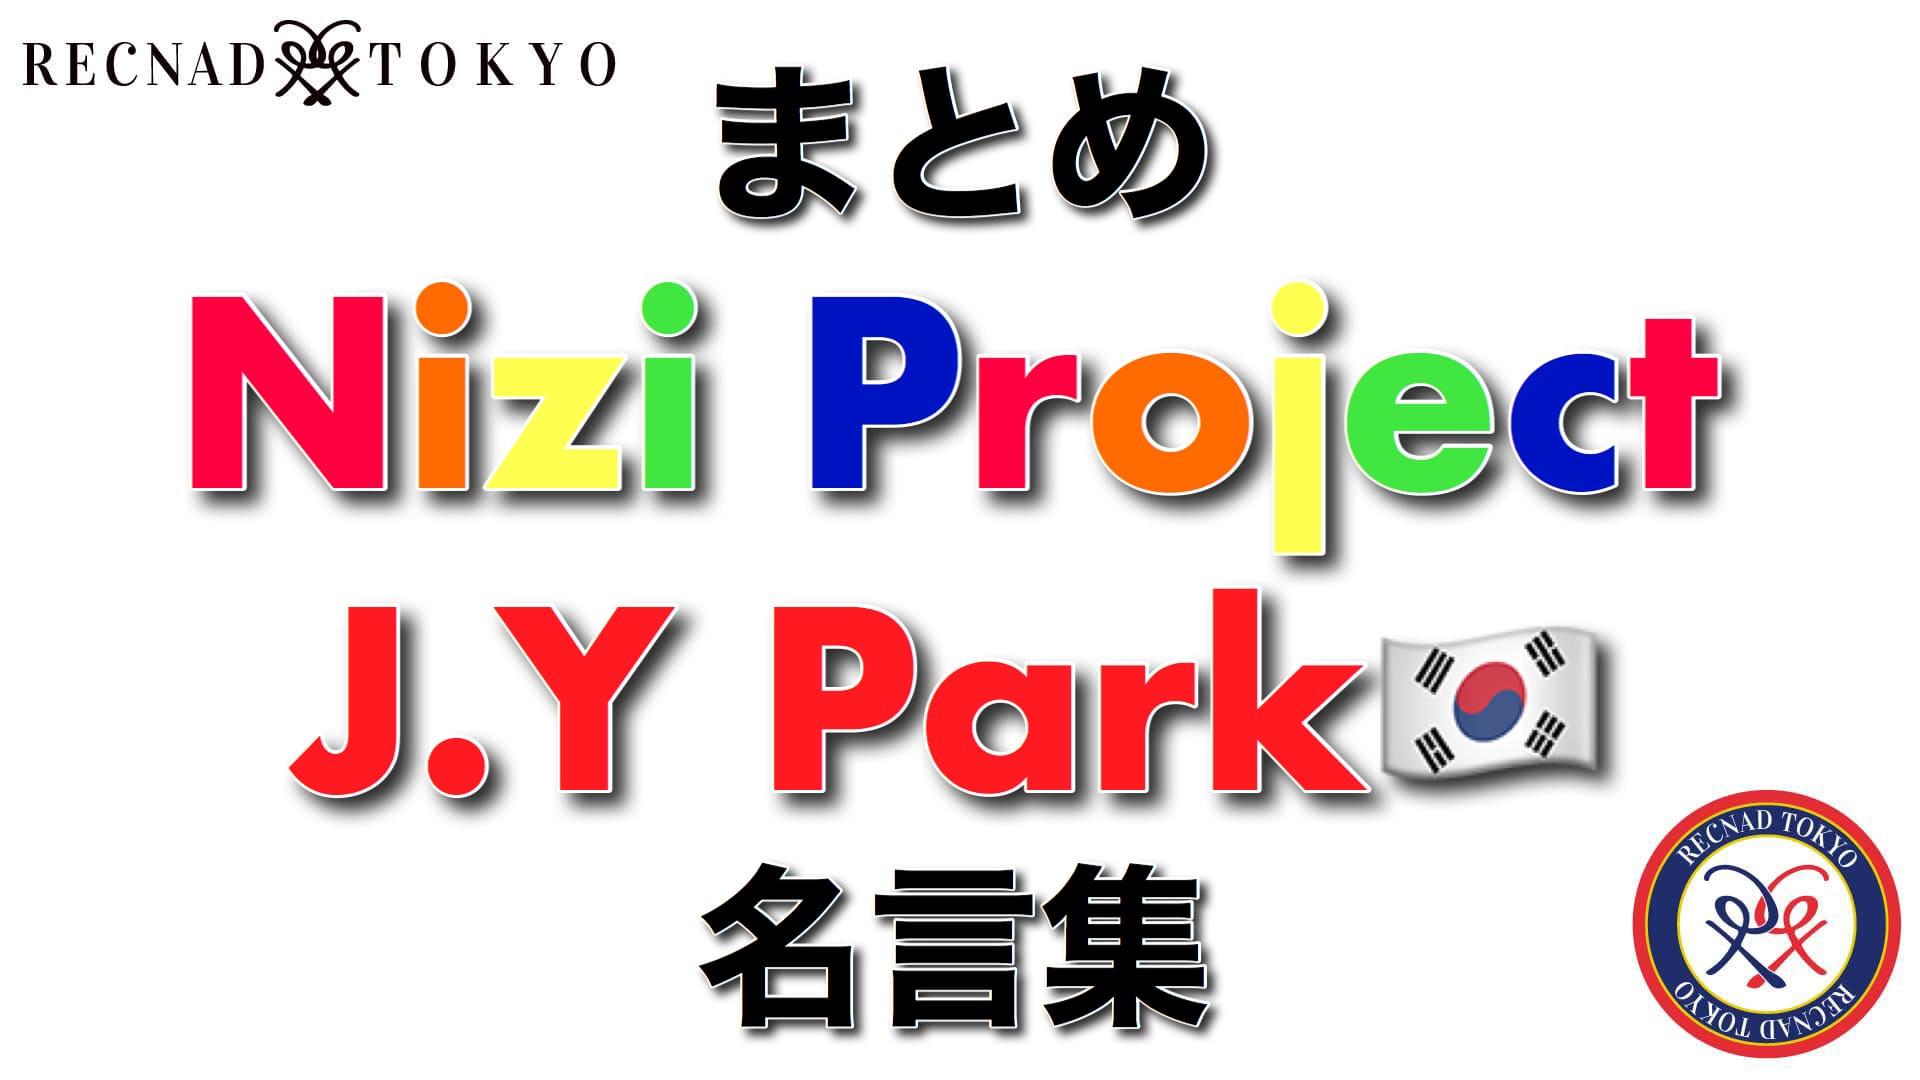 Nizi Project J.Y.Park 名言集2 | カリスマ パク・ジニョン氏YouTube まとめ